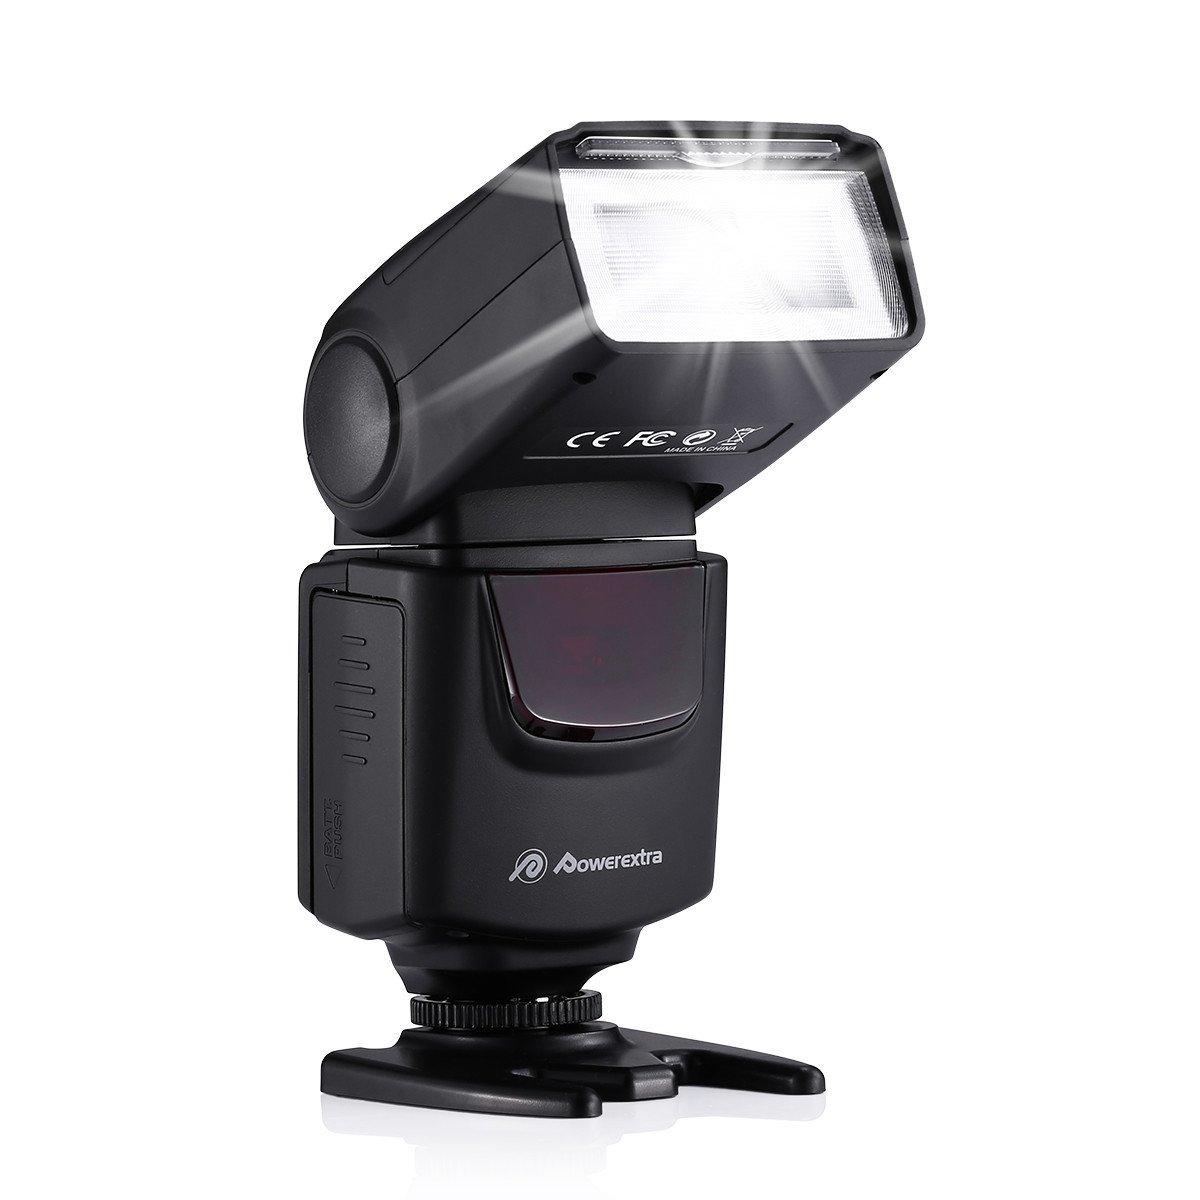 Powerextra Professional DF-400 Speedlite Camera Flash for Canon Nikon Pentax Samsung Fujifilm Olympus Panasonic Sigma Minolta Leica Ricoh DSLR Cameras and Digital Cameras with Single-Contact Hotshoe